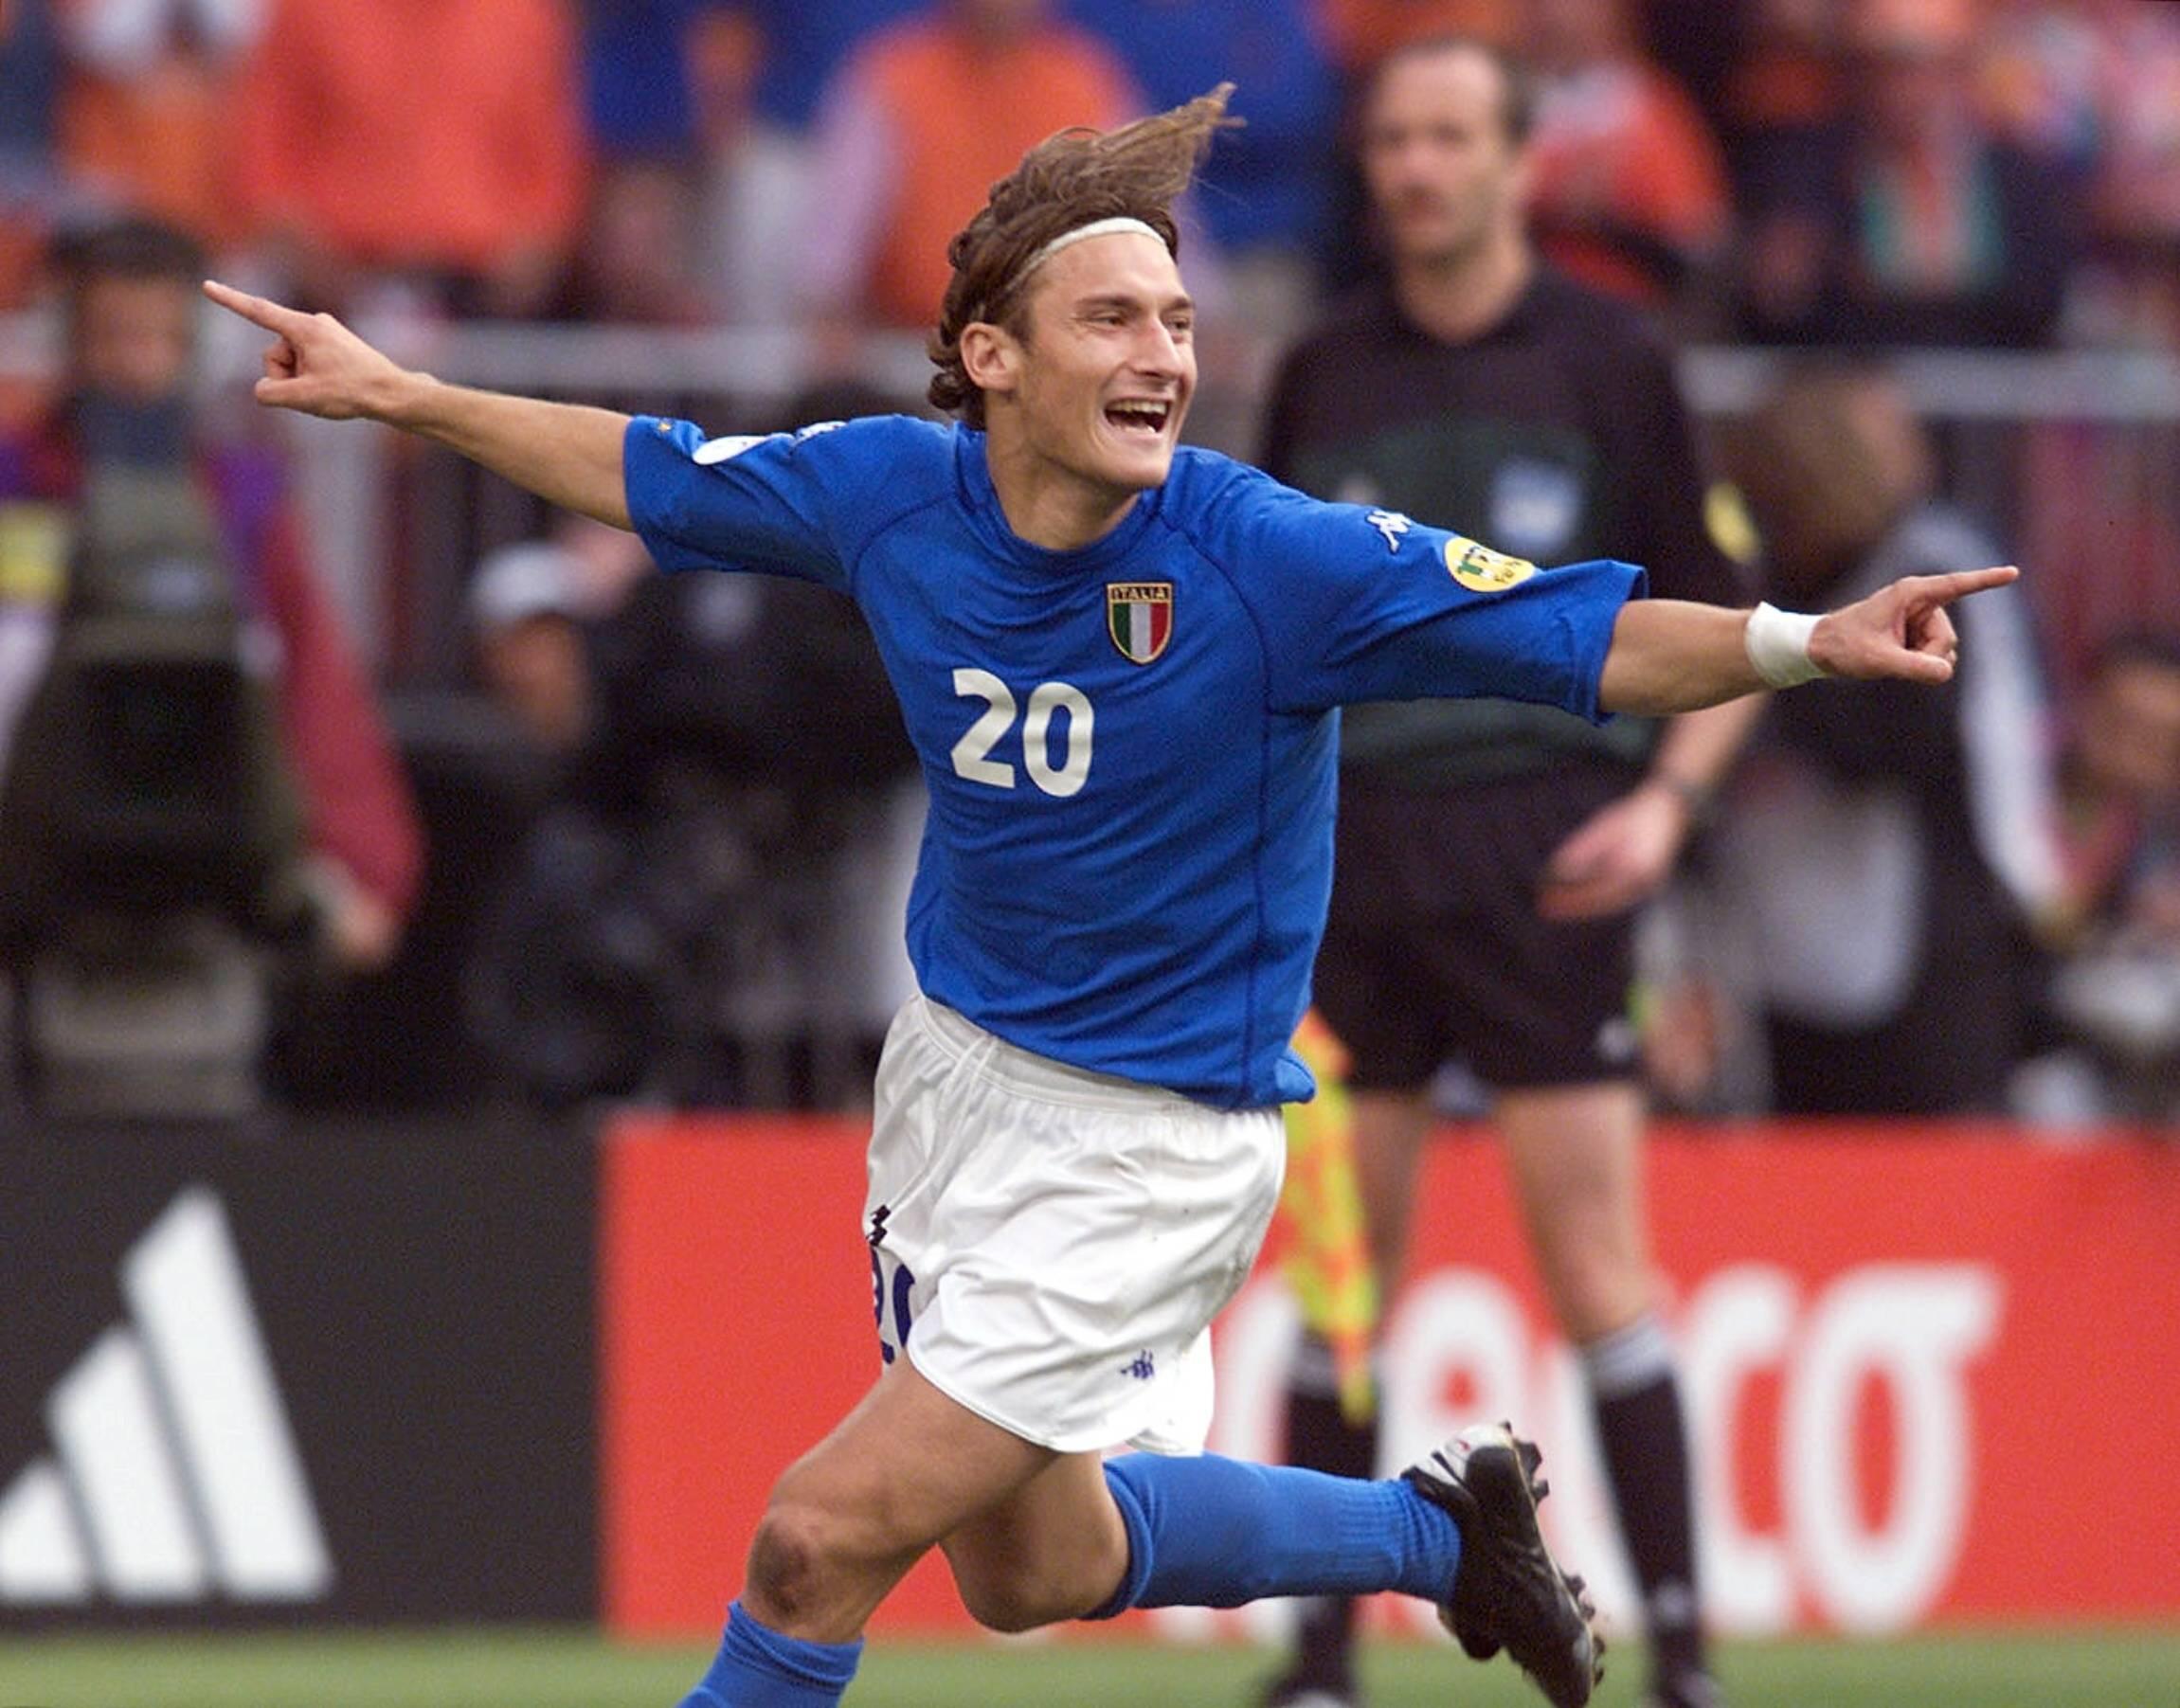 Memoria Heroica Italia Segurou A Pressao Da Holanda E Avancou Para A Final Da Euro 2000 Calciopedia